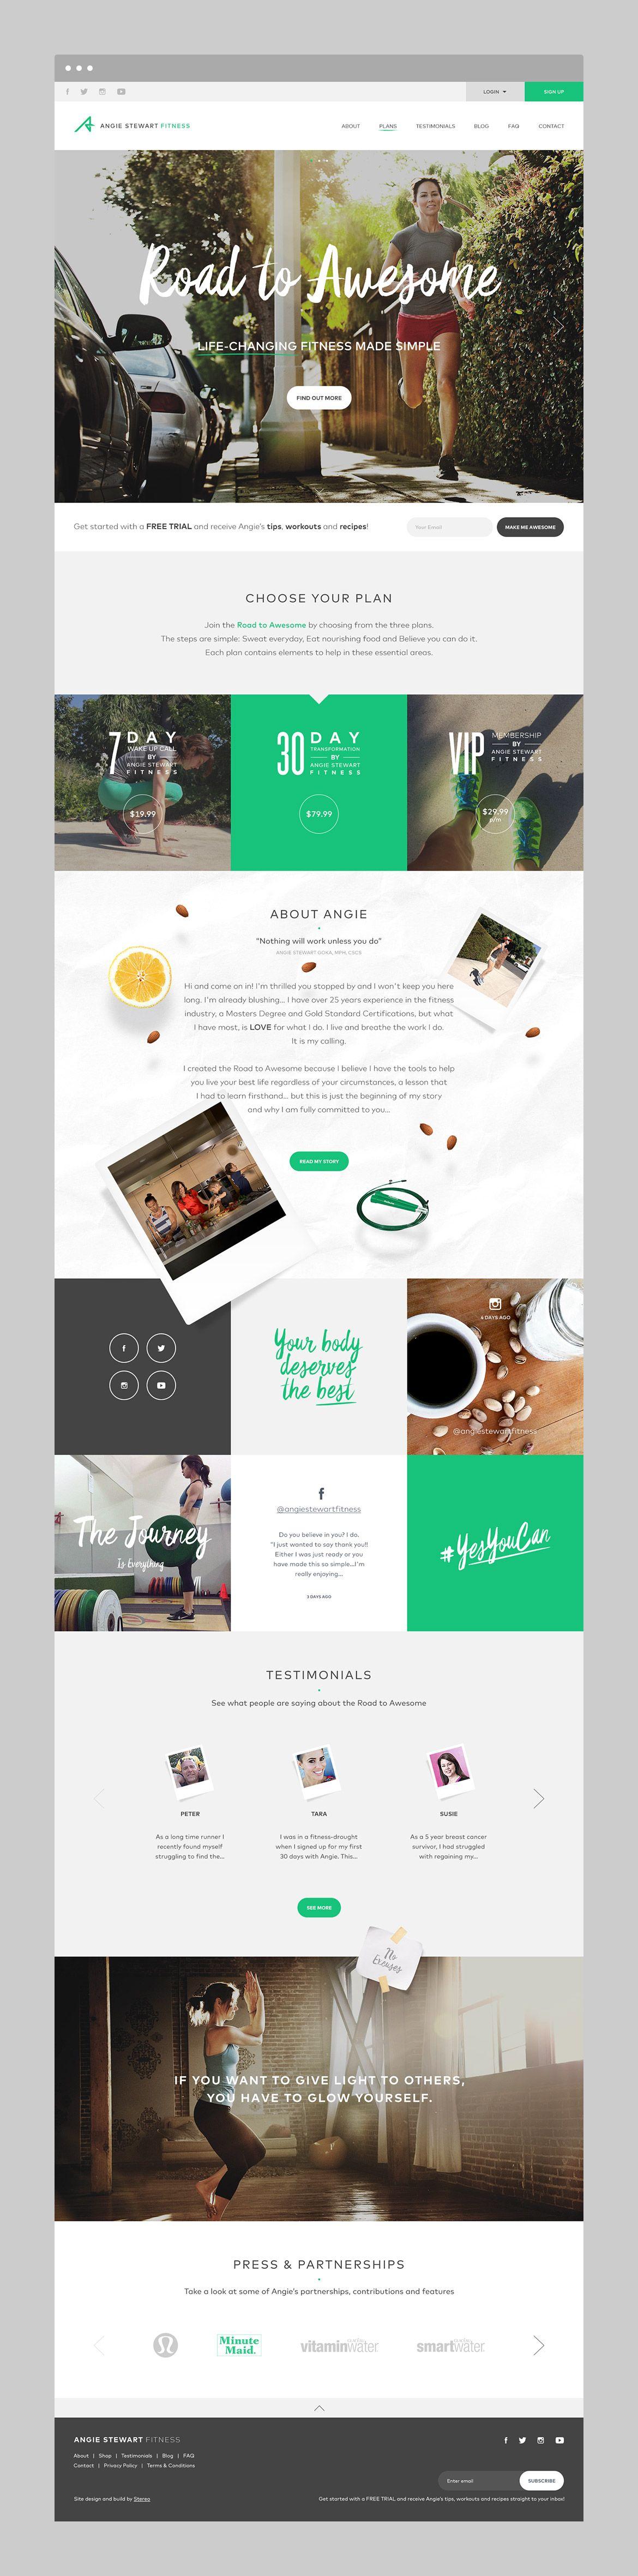 StudioMH — Multi-Disciplinary Design & Illustration Studio › Angie Stewart Fitness